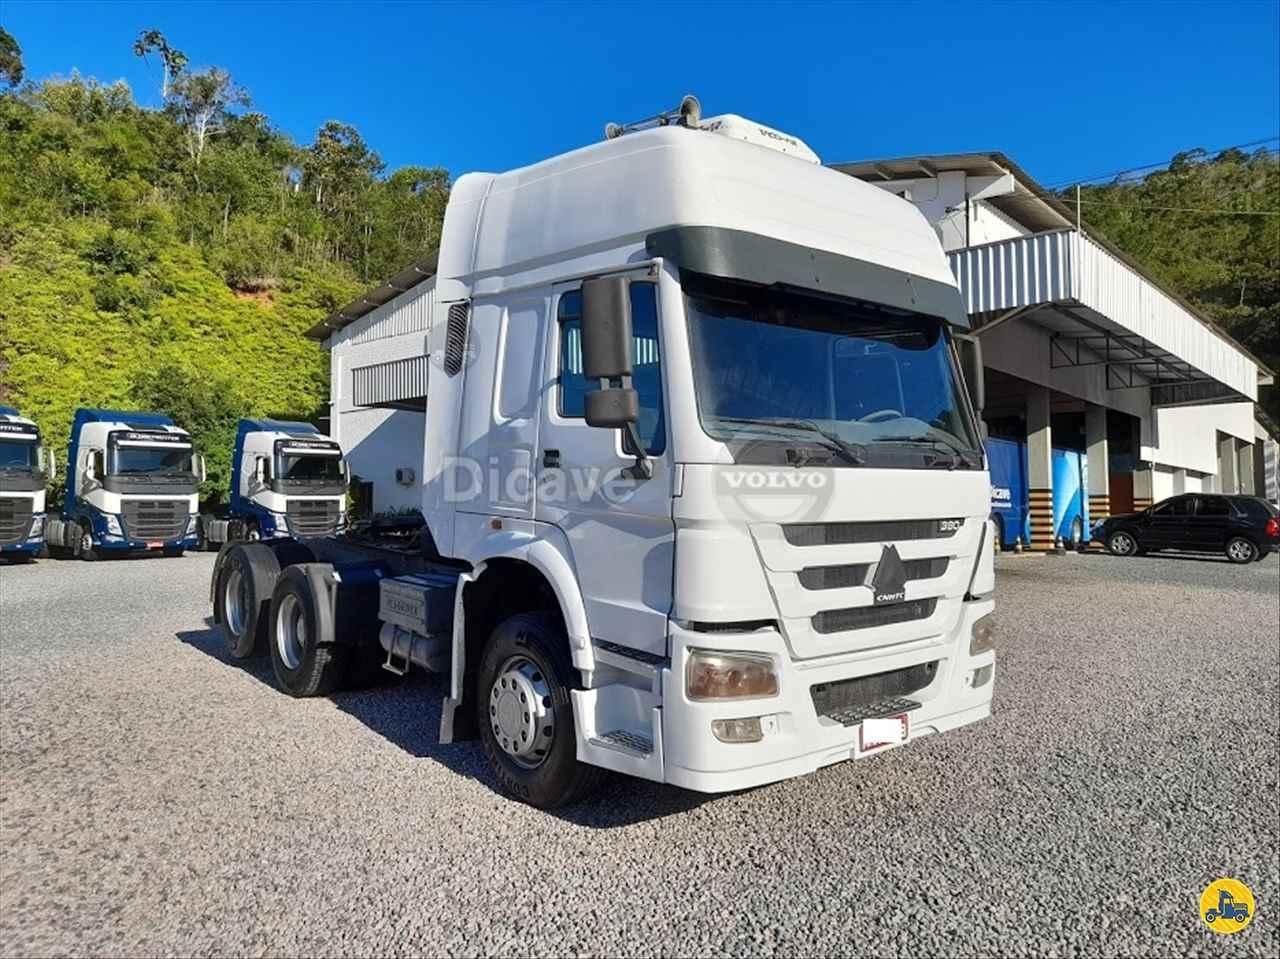 CAMINHAO SINOTRUK HOWO 380 Cavalo Mecânico Truck 6x2 Dicave Viking Center - Volvo ITAJAI SANTA CATARINA SC